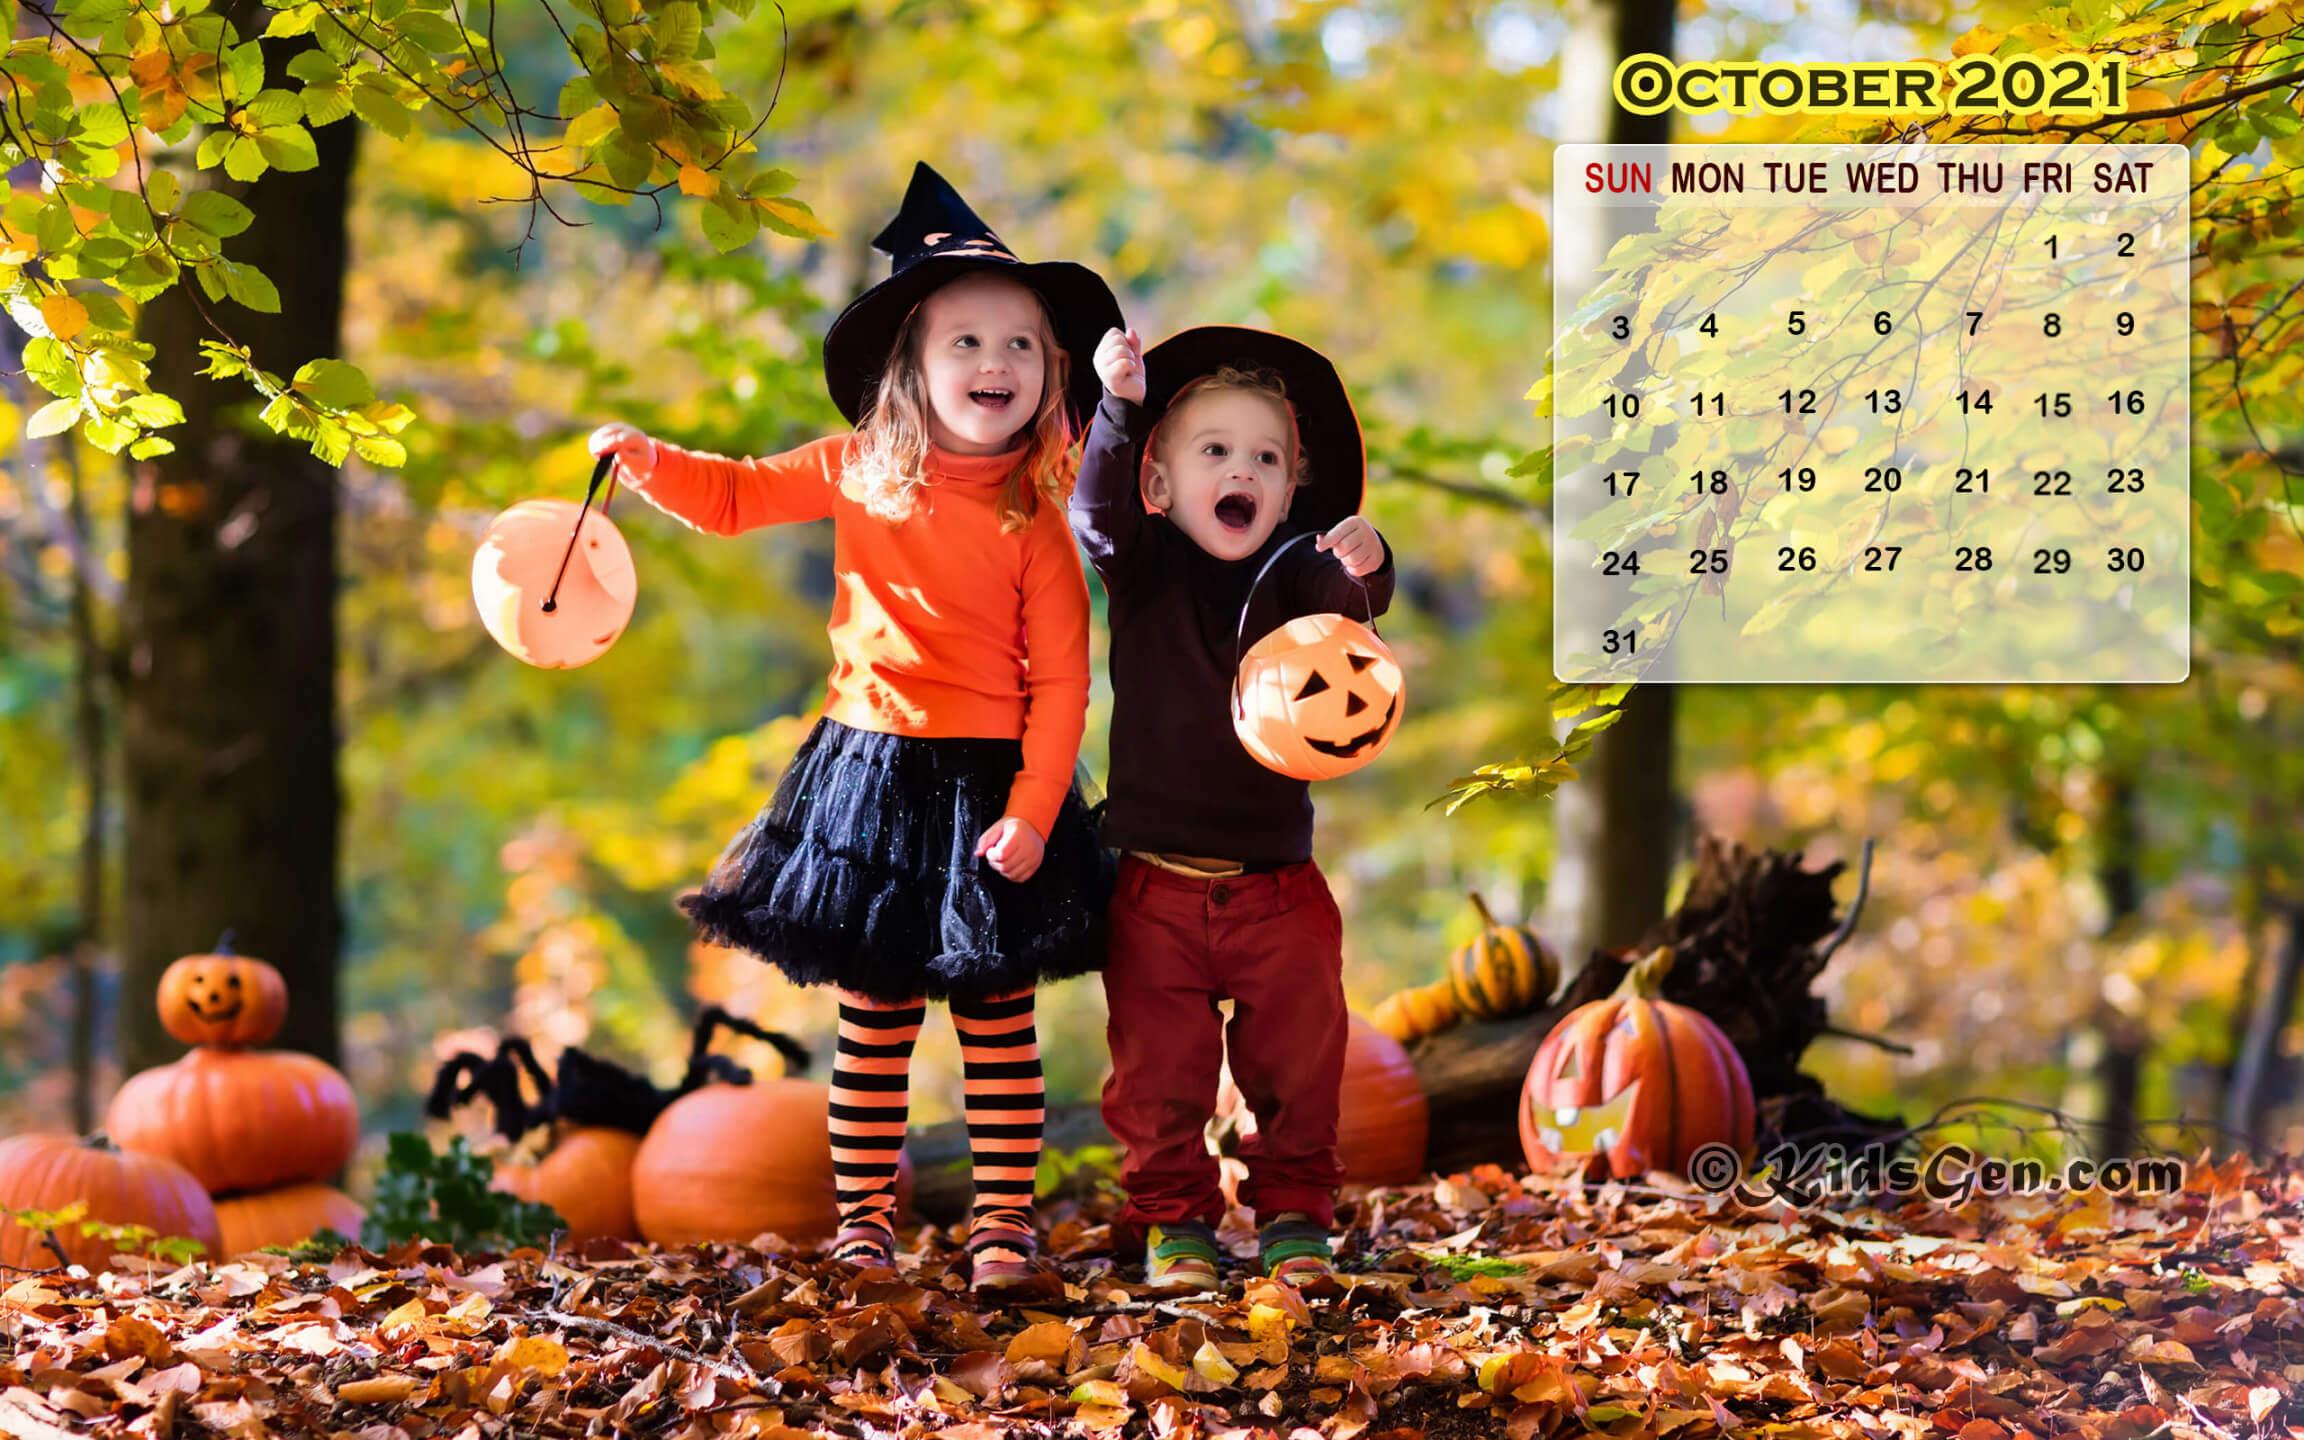 October 2021 Calendar Wallpaper for Desktop